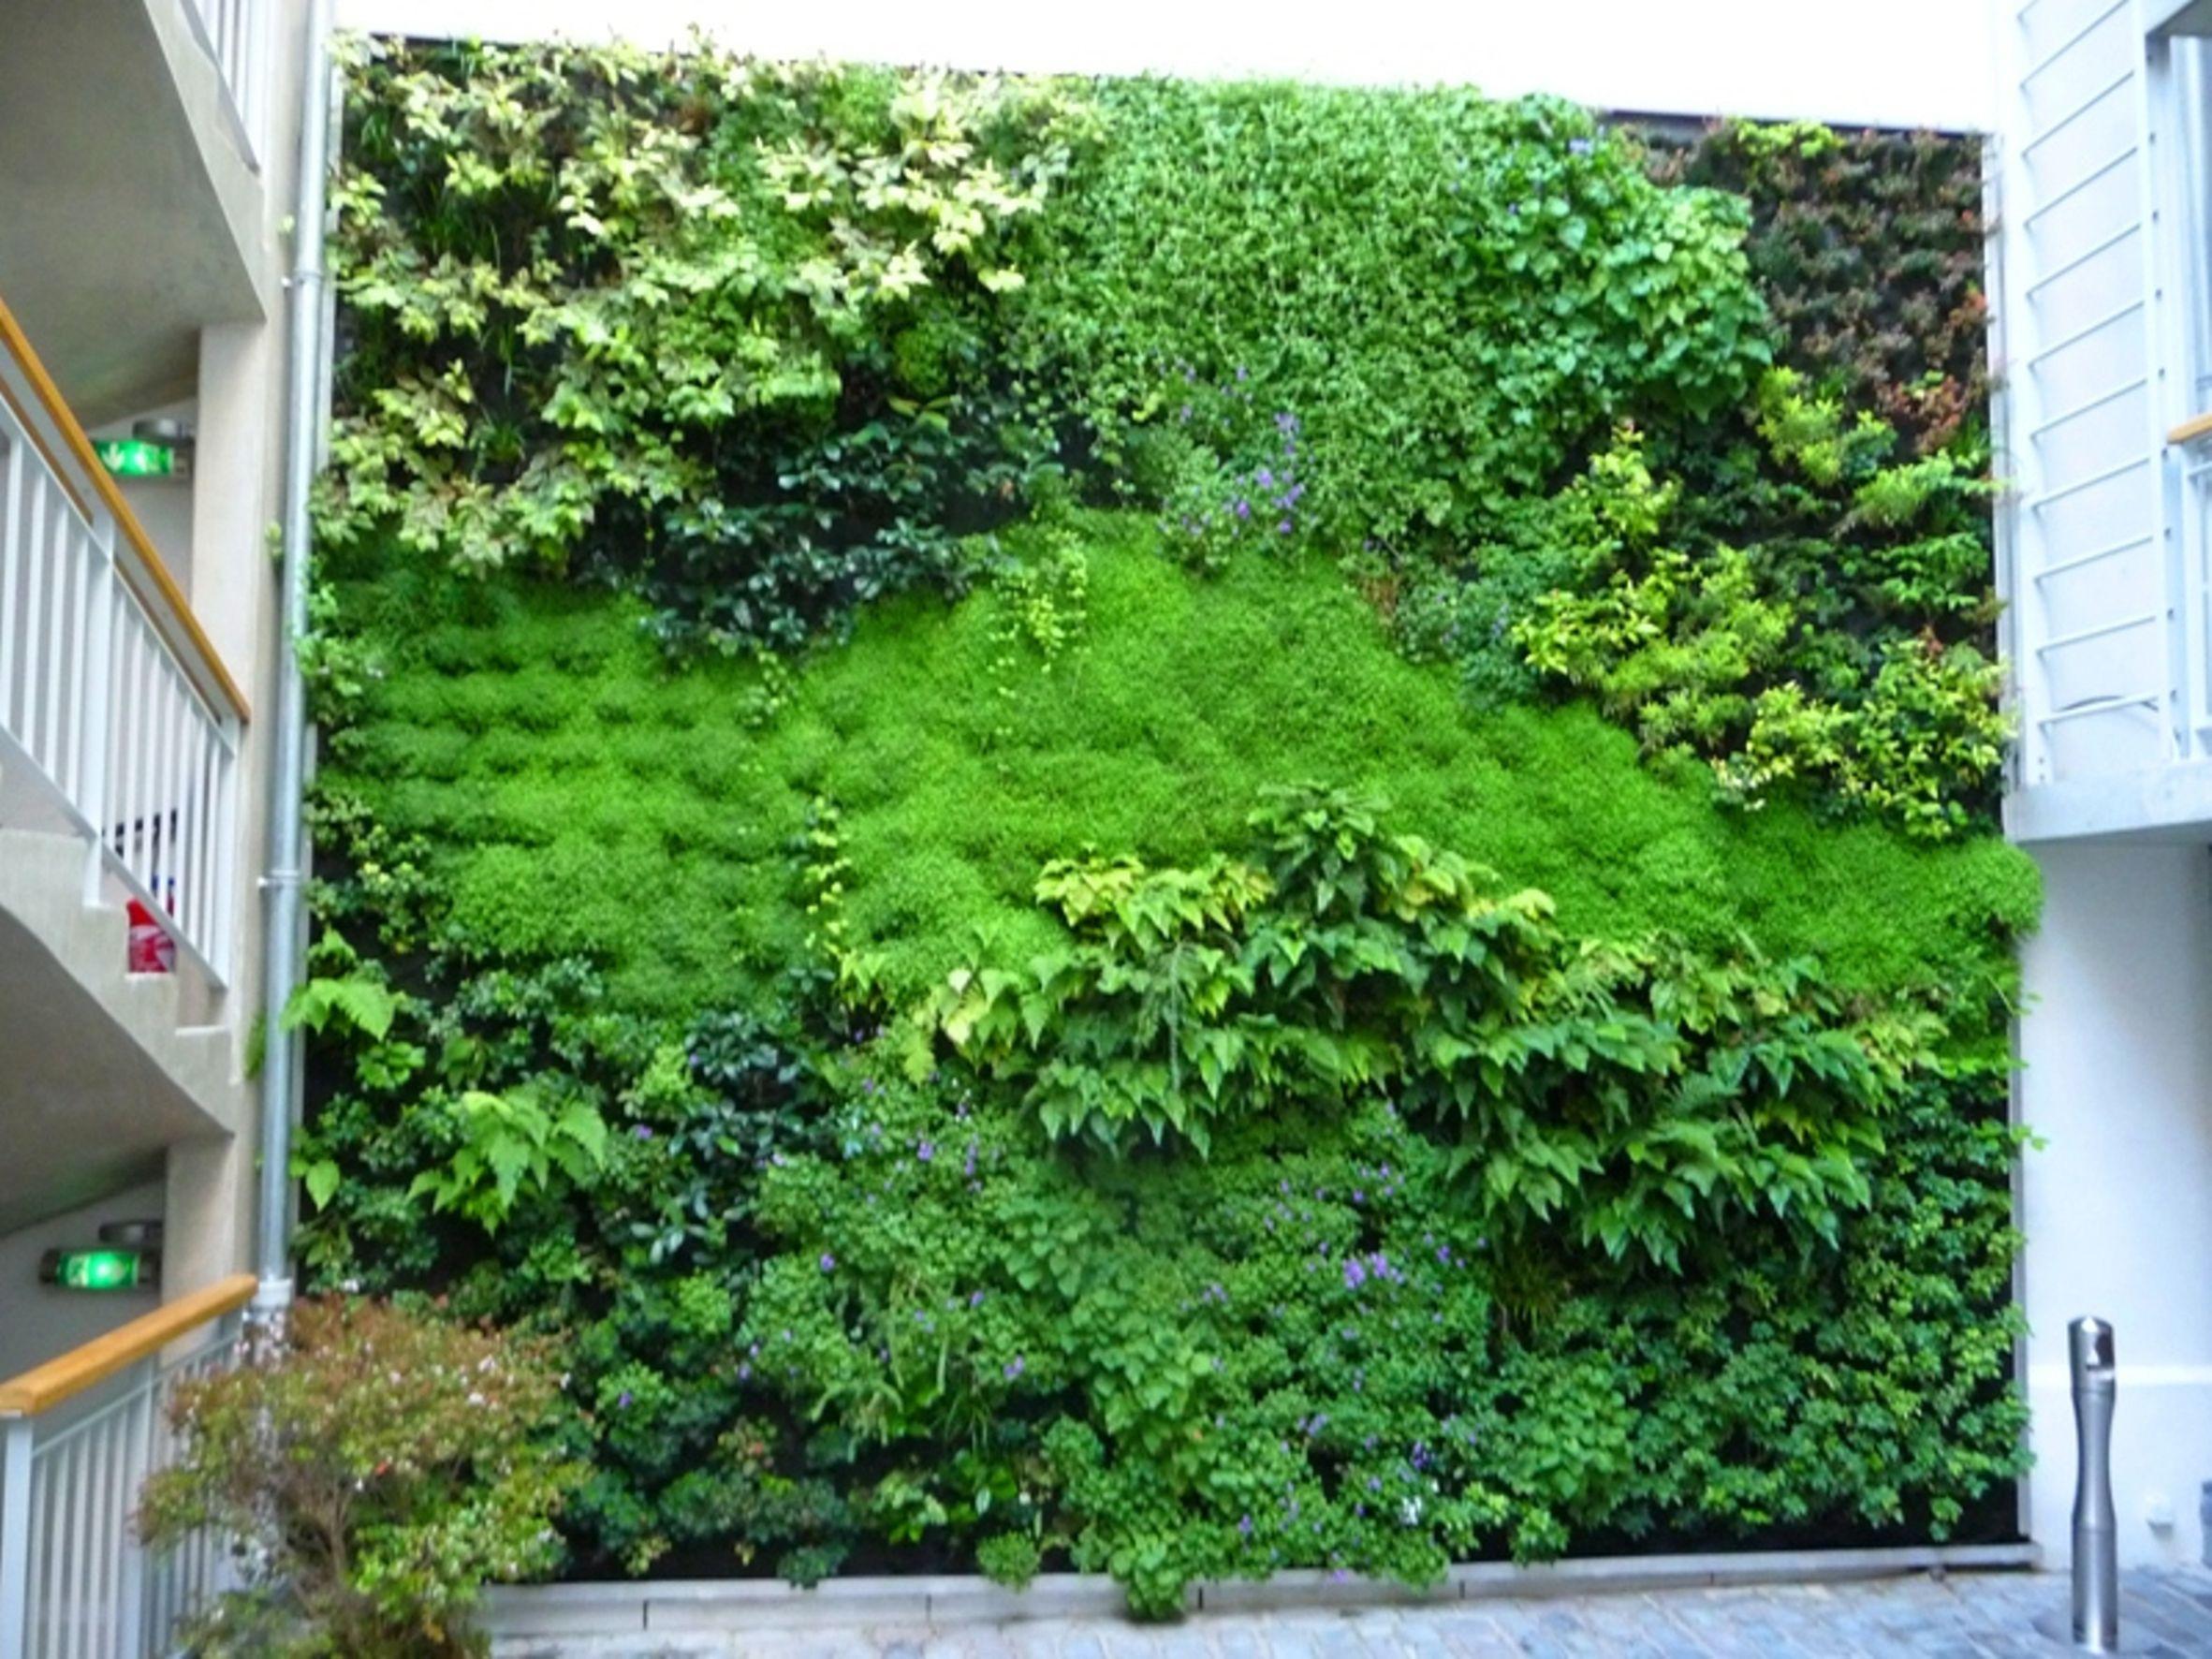 mur v g tal int rieur ecodesign pinterest green. Black Bedroom Furniture Sets. Home Design Ideas